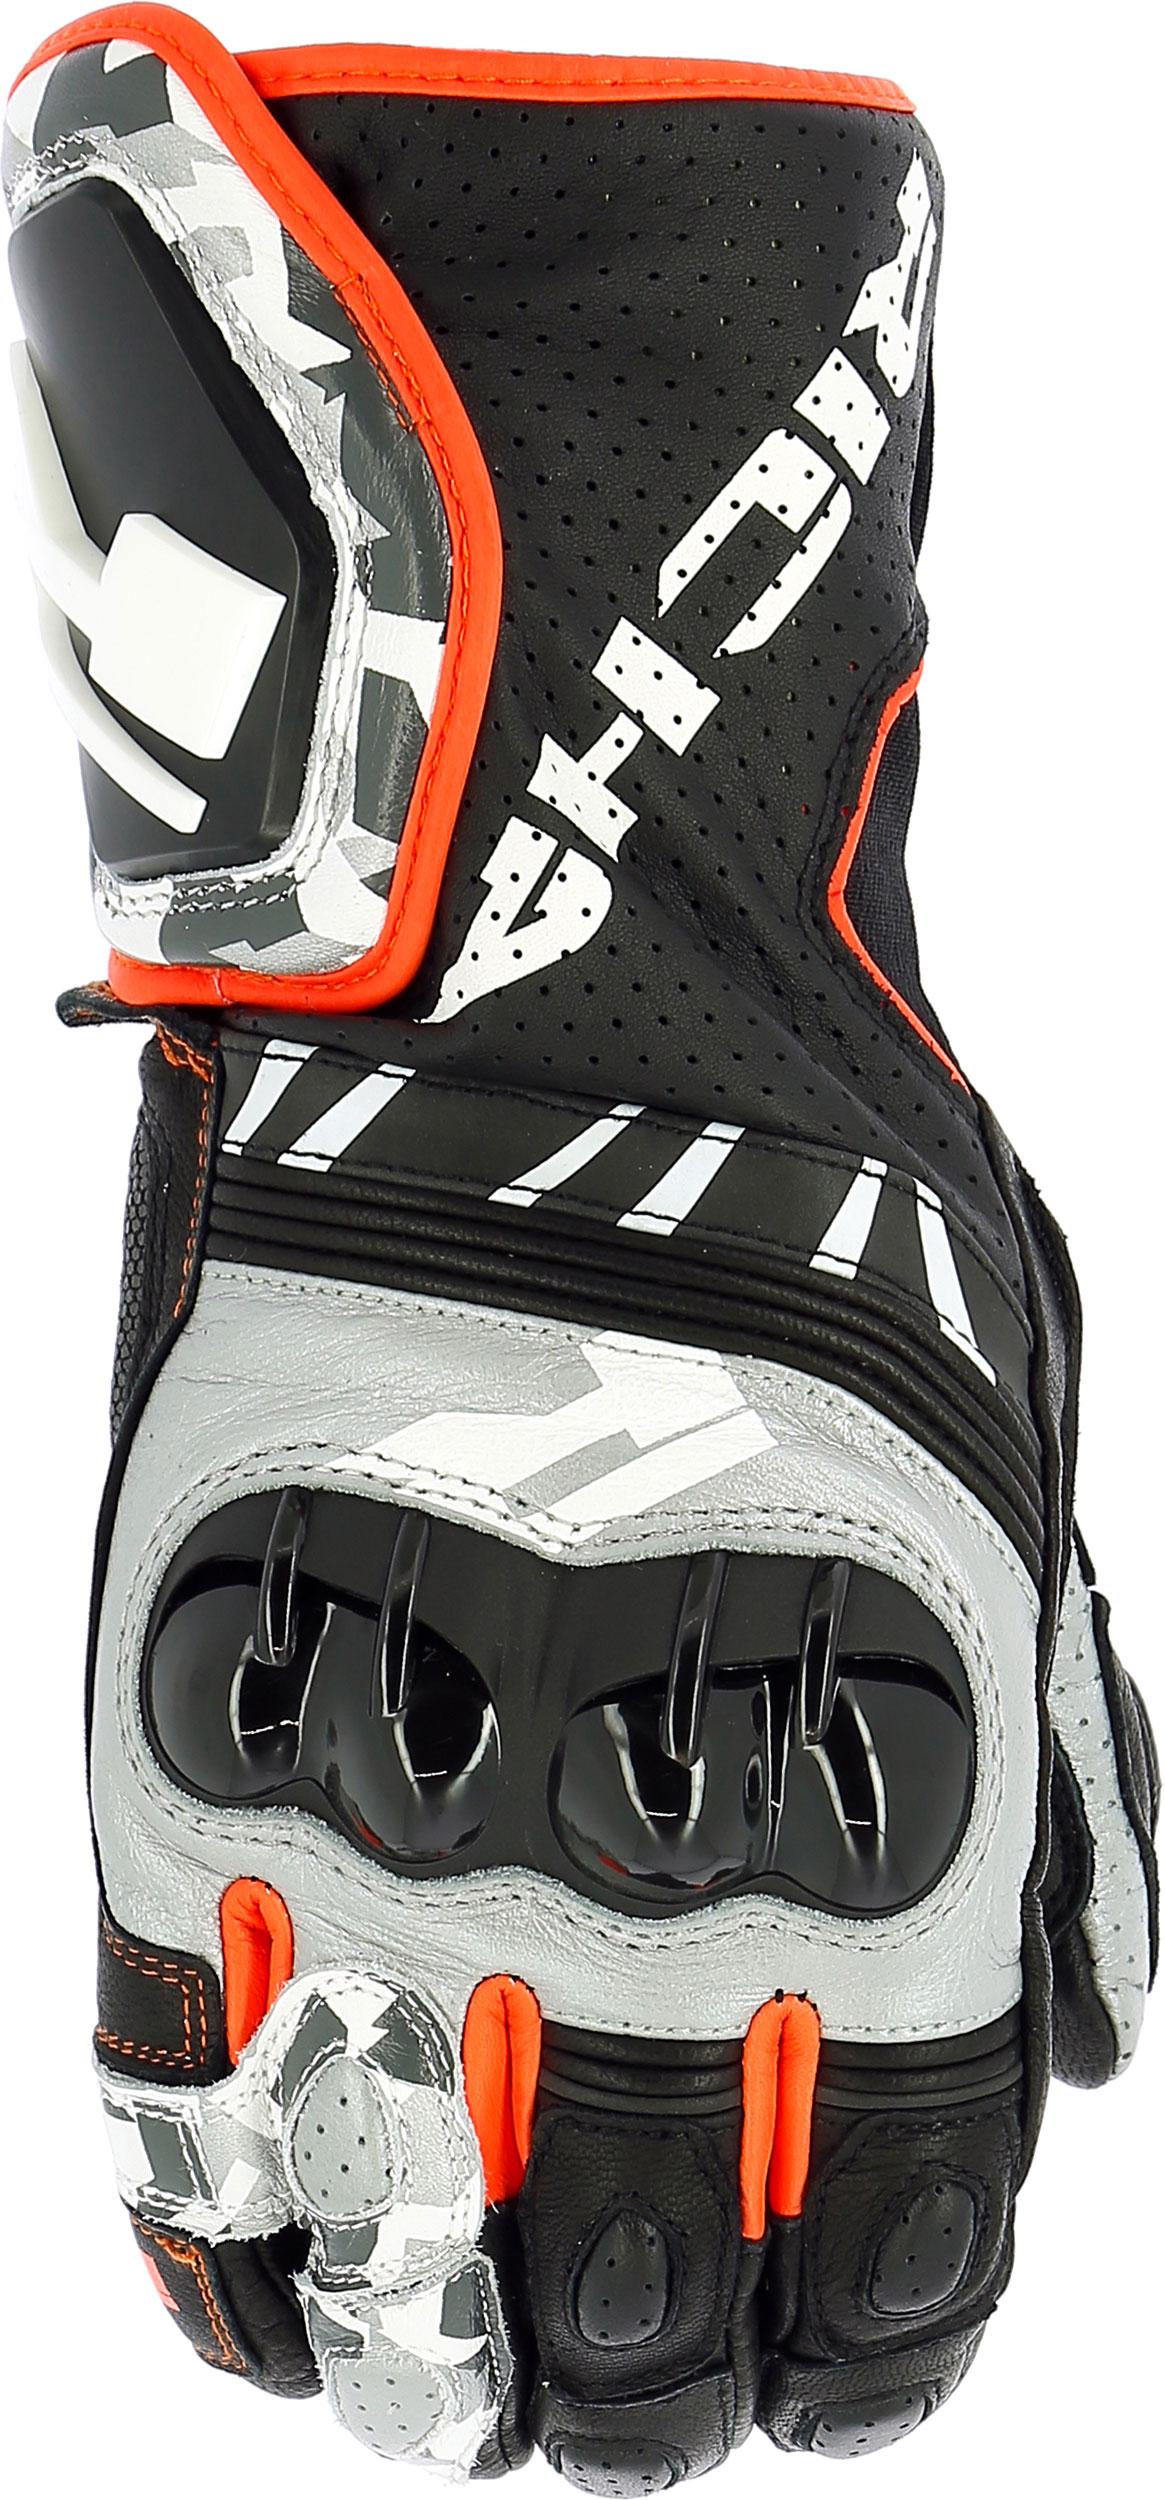 Richa R-Pro Racing, Handschuhe - Grau/Neon-Rot - XL 5RPRO-920-XL